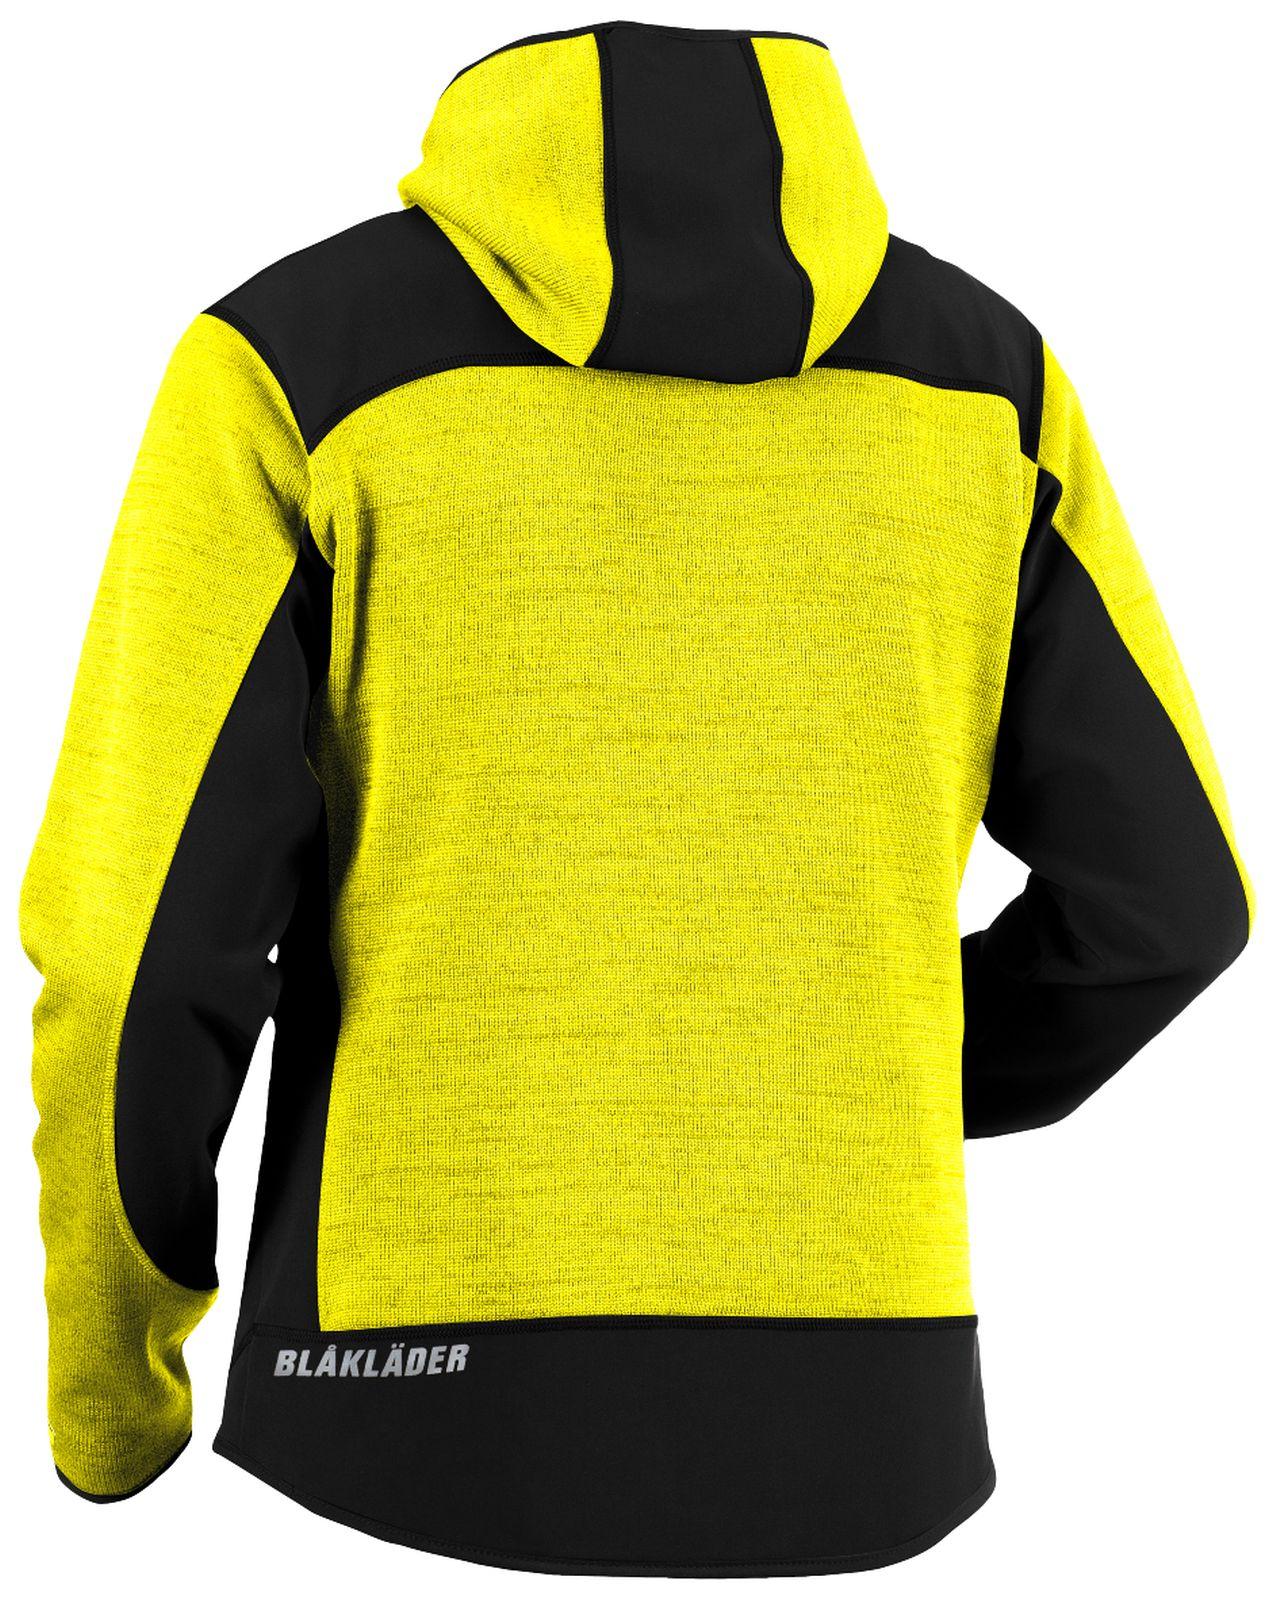 Blaklader Vesten 49302117 geel-zwart(3399)